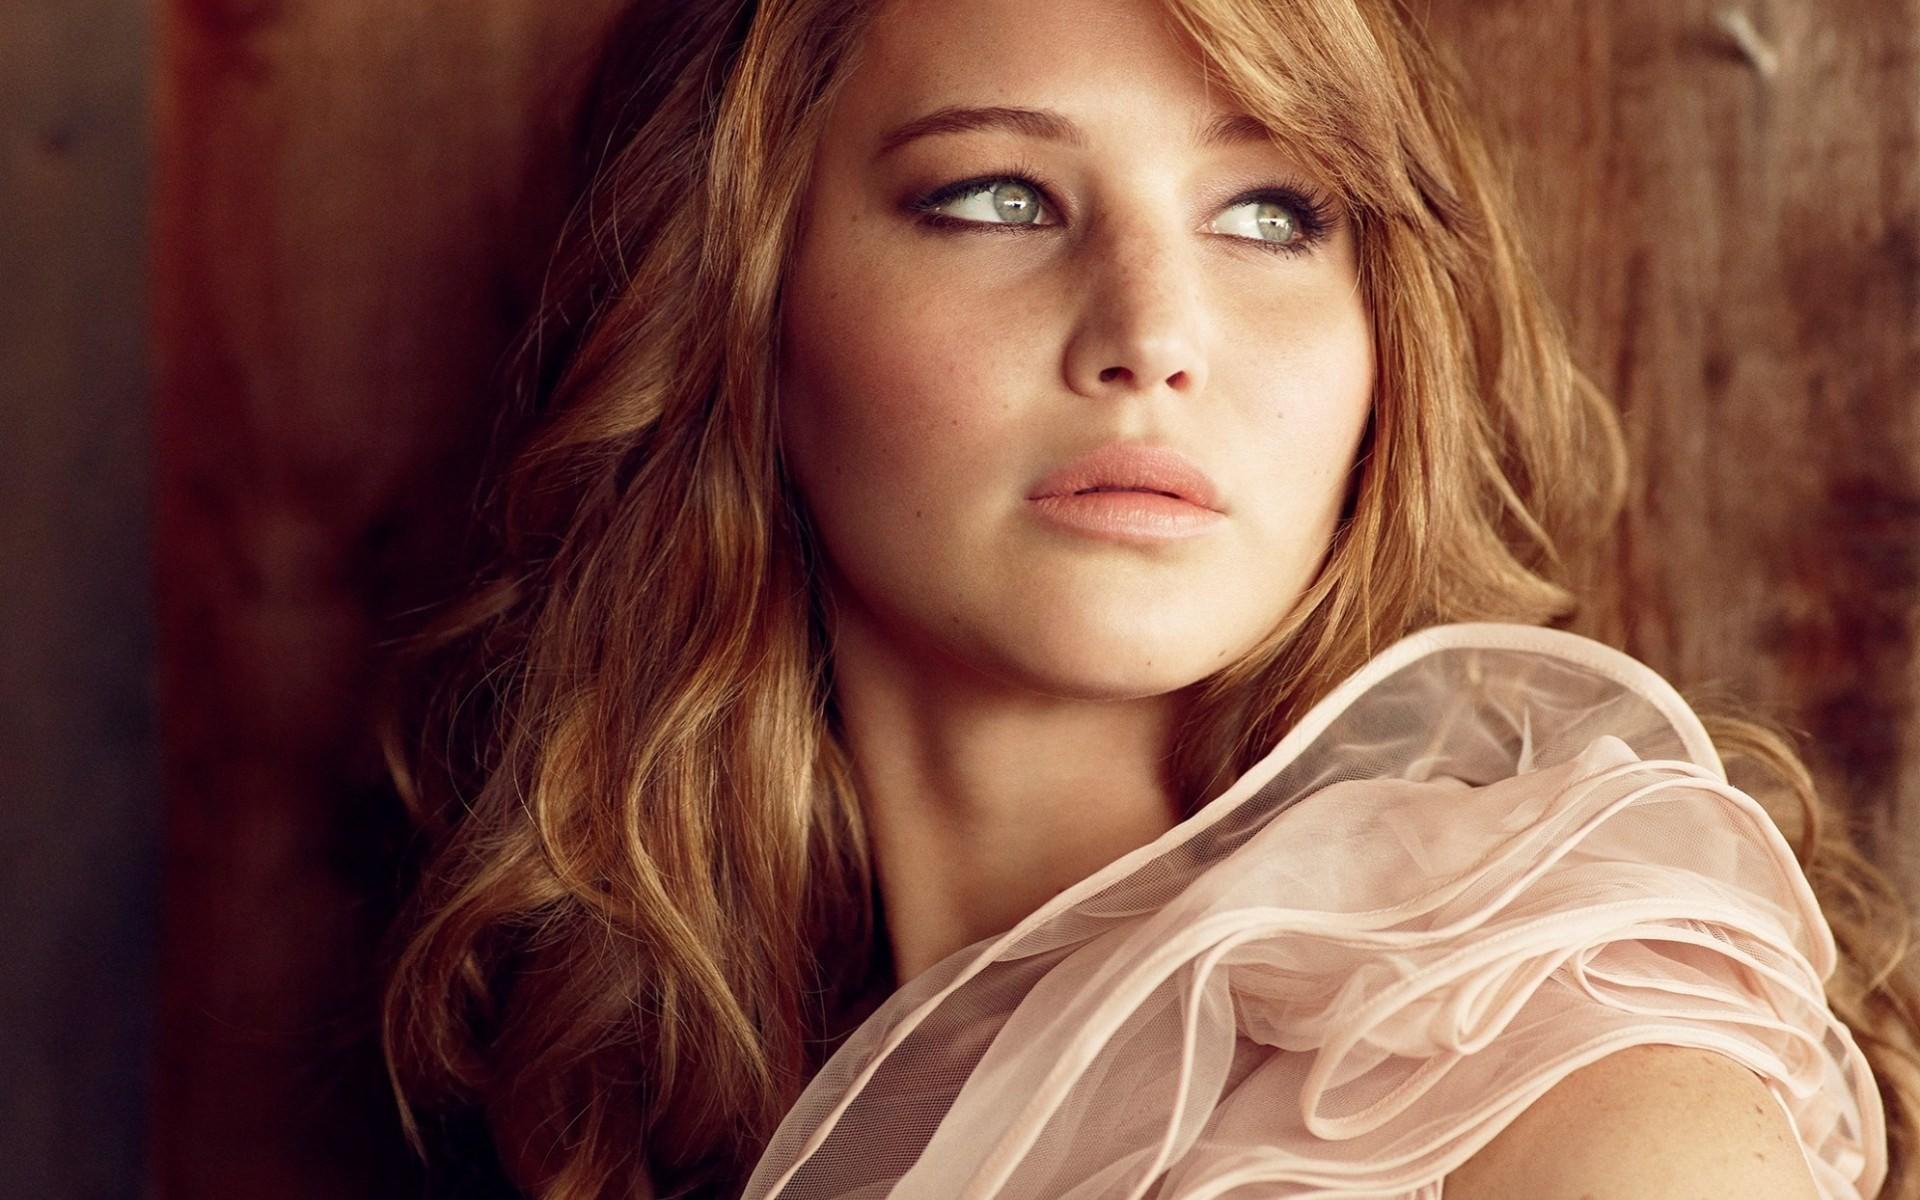 Wallpaper Face Women Long Hair Actress Nose Jennifer Lawrence